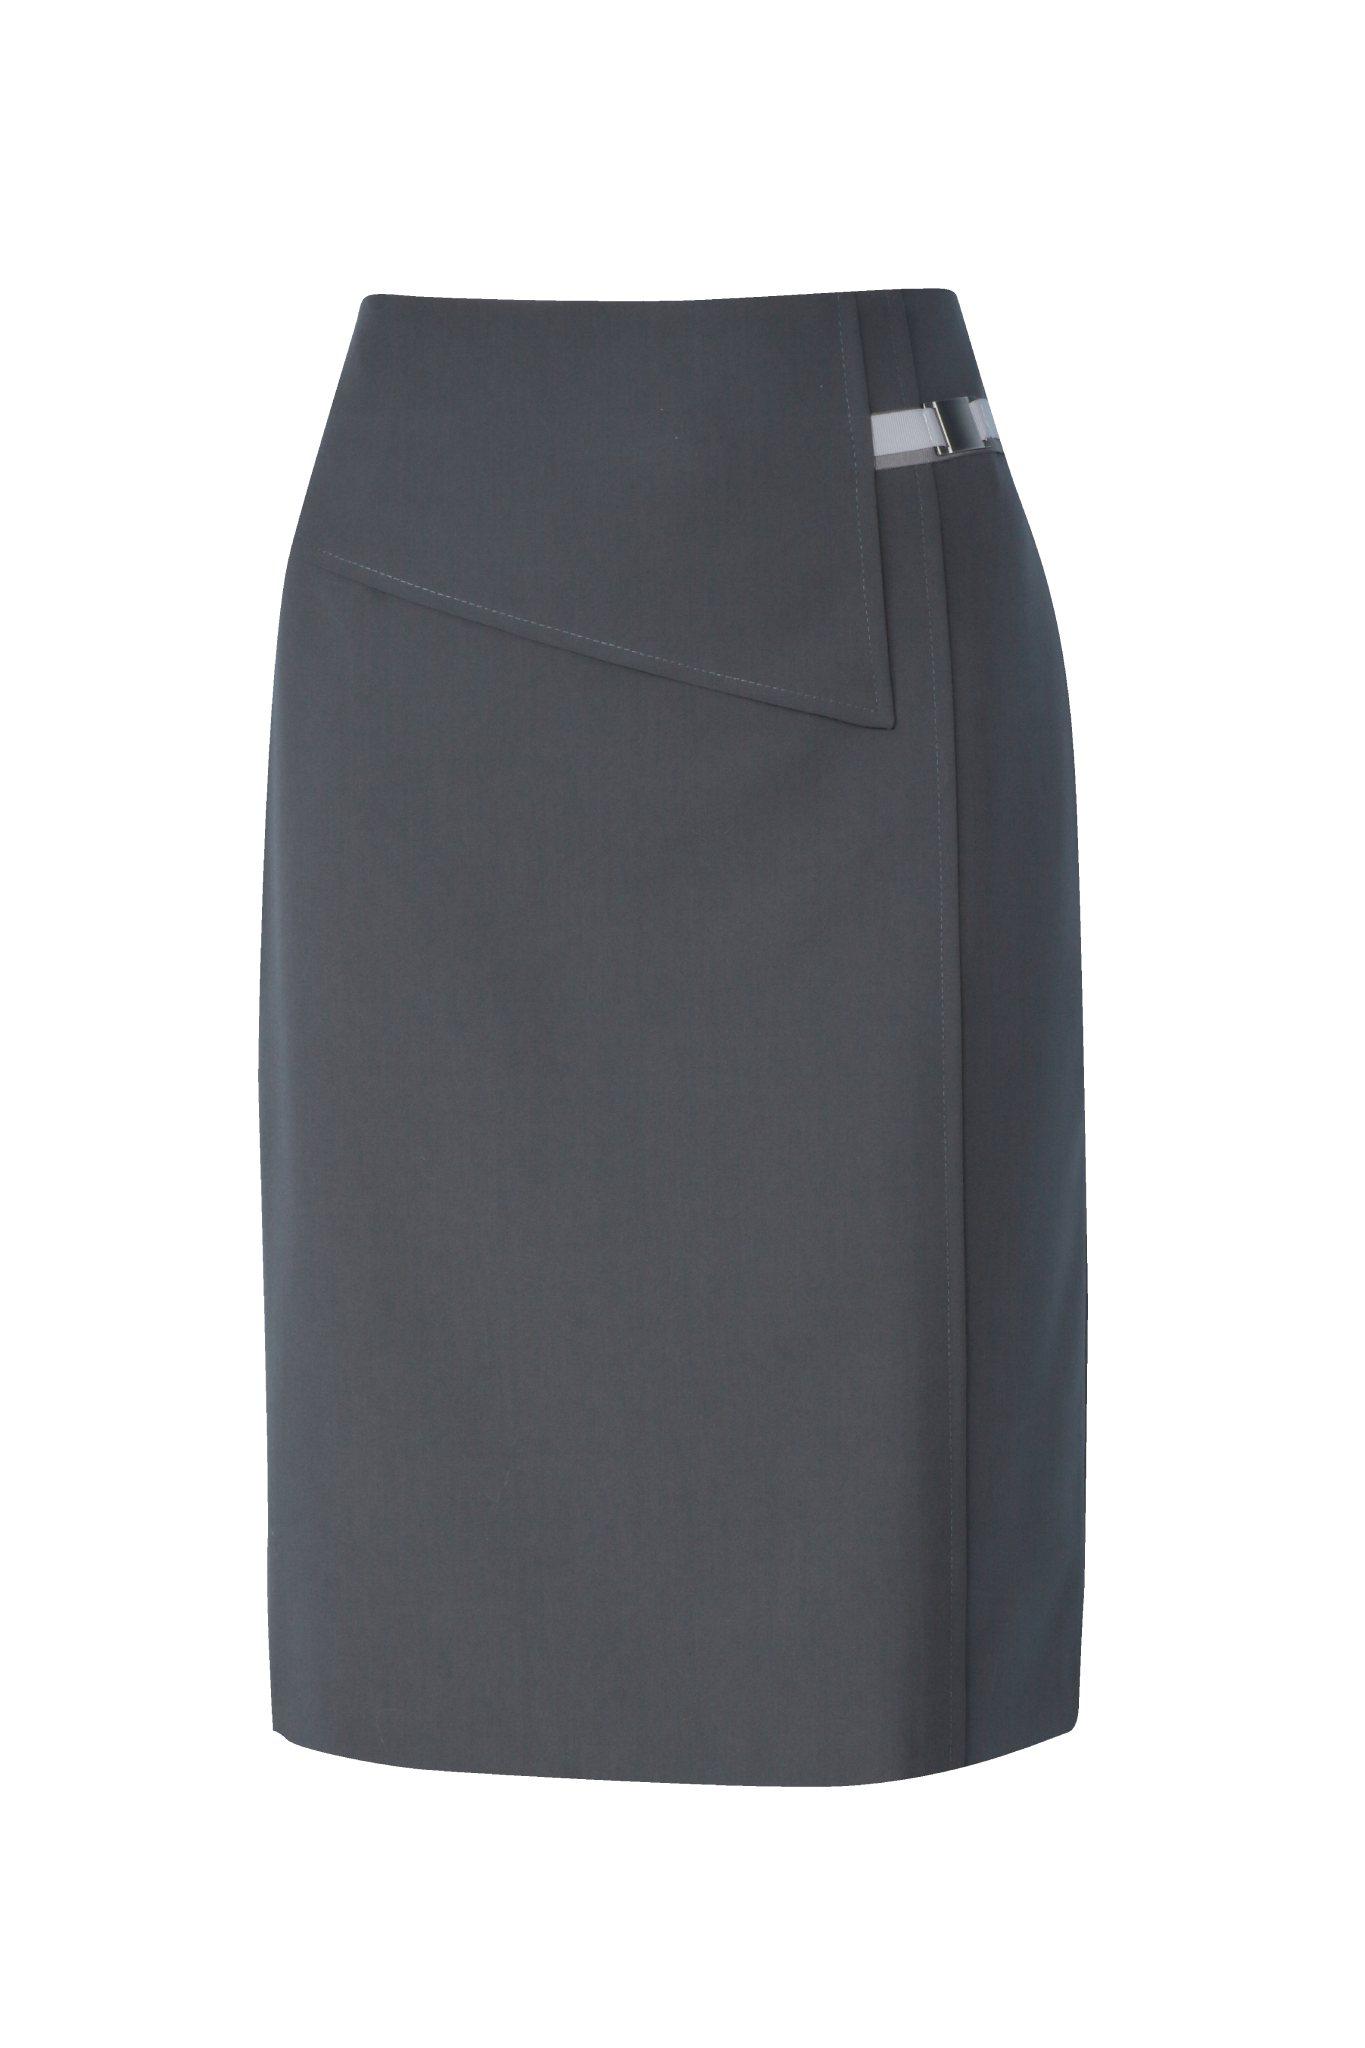 1106 Jumitex ciemnoszara spodnica z klamerka